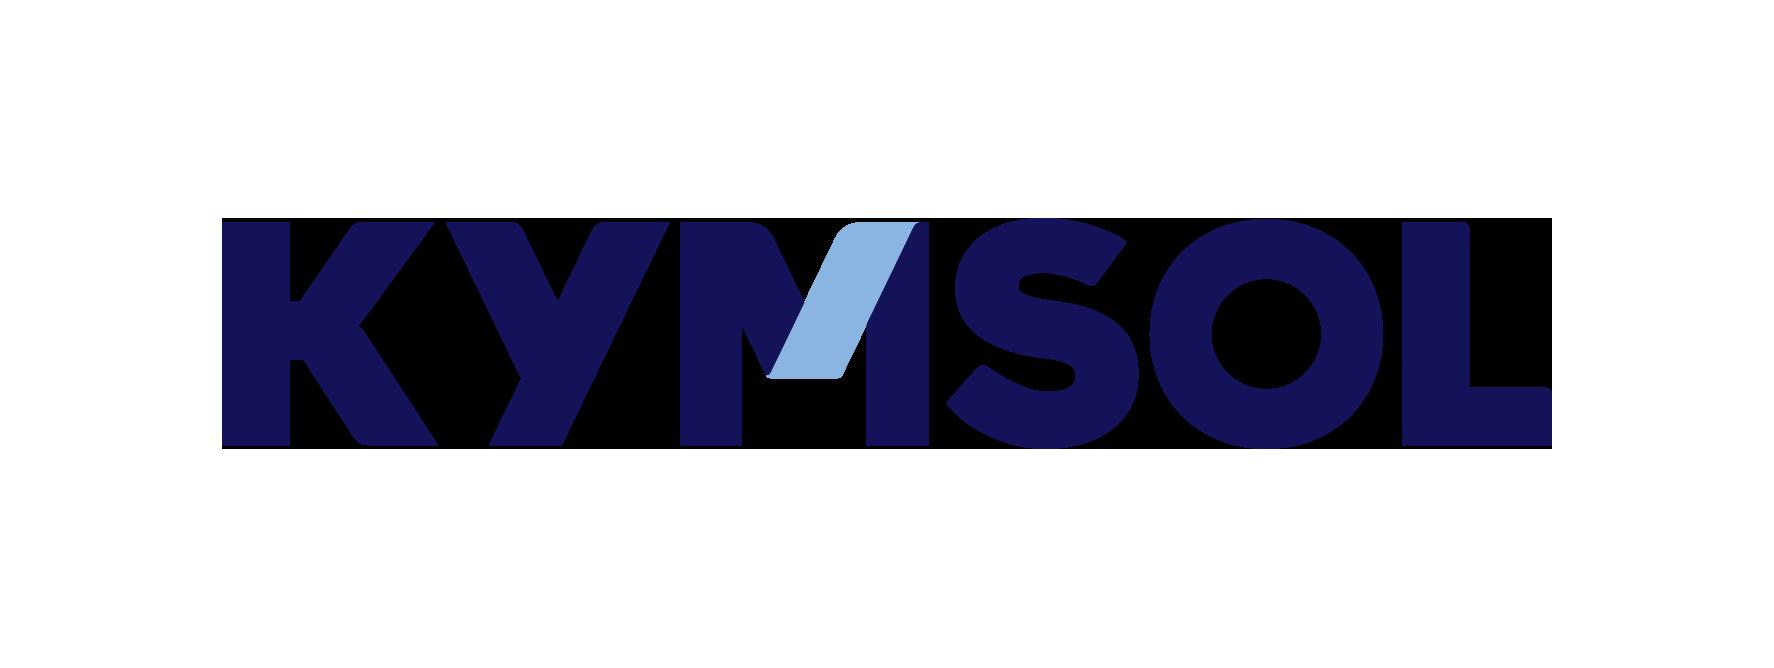 Kymsol-logo-RGB